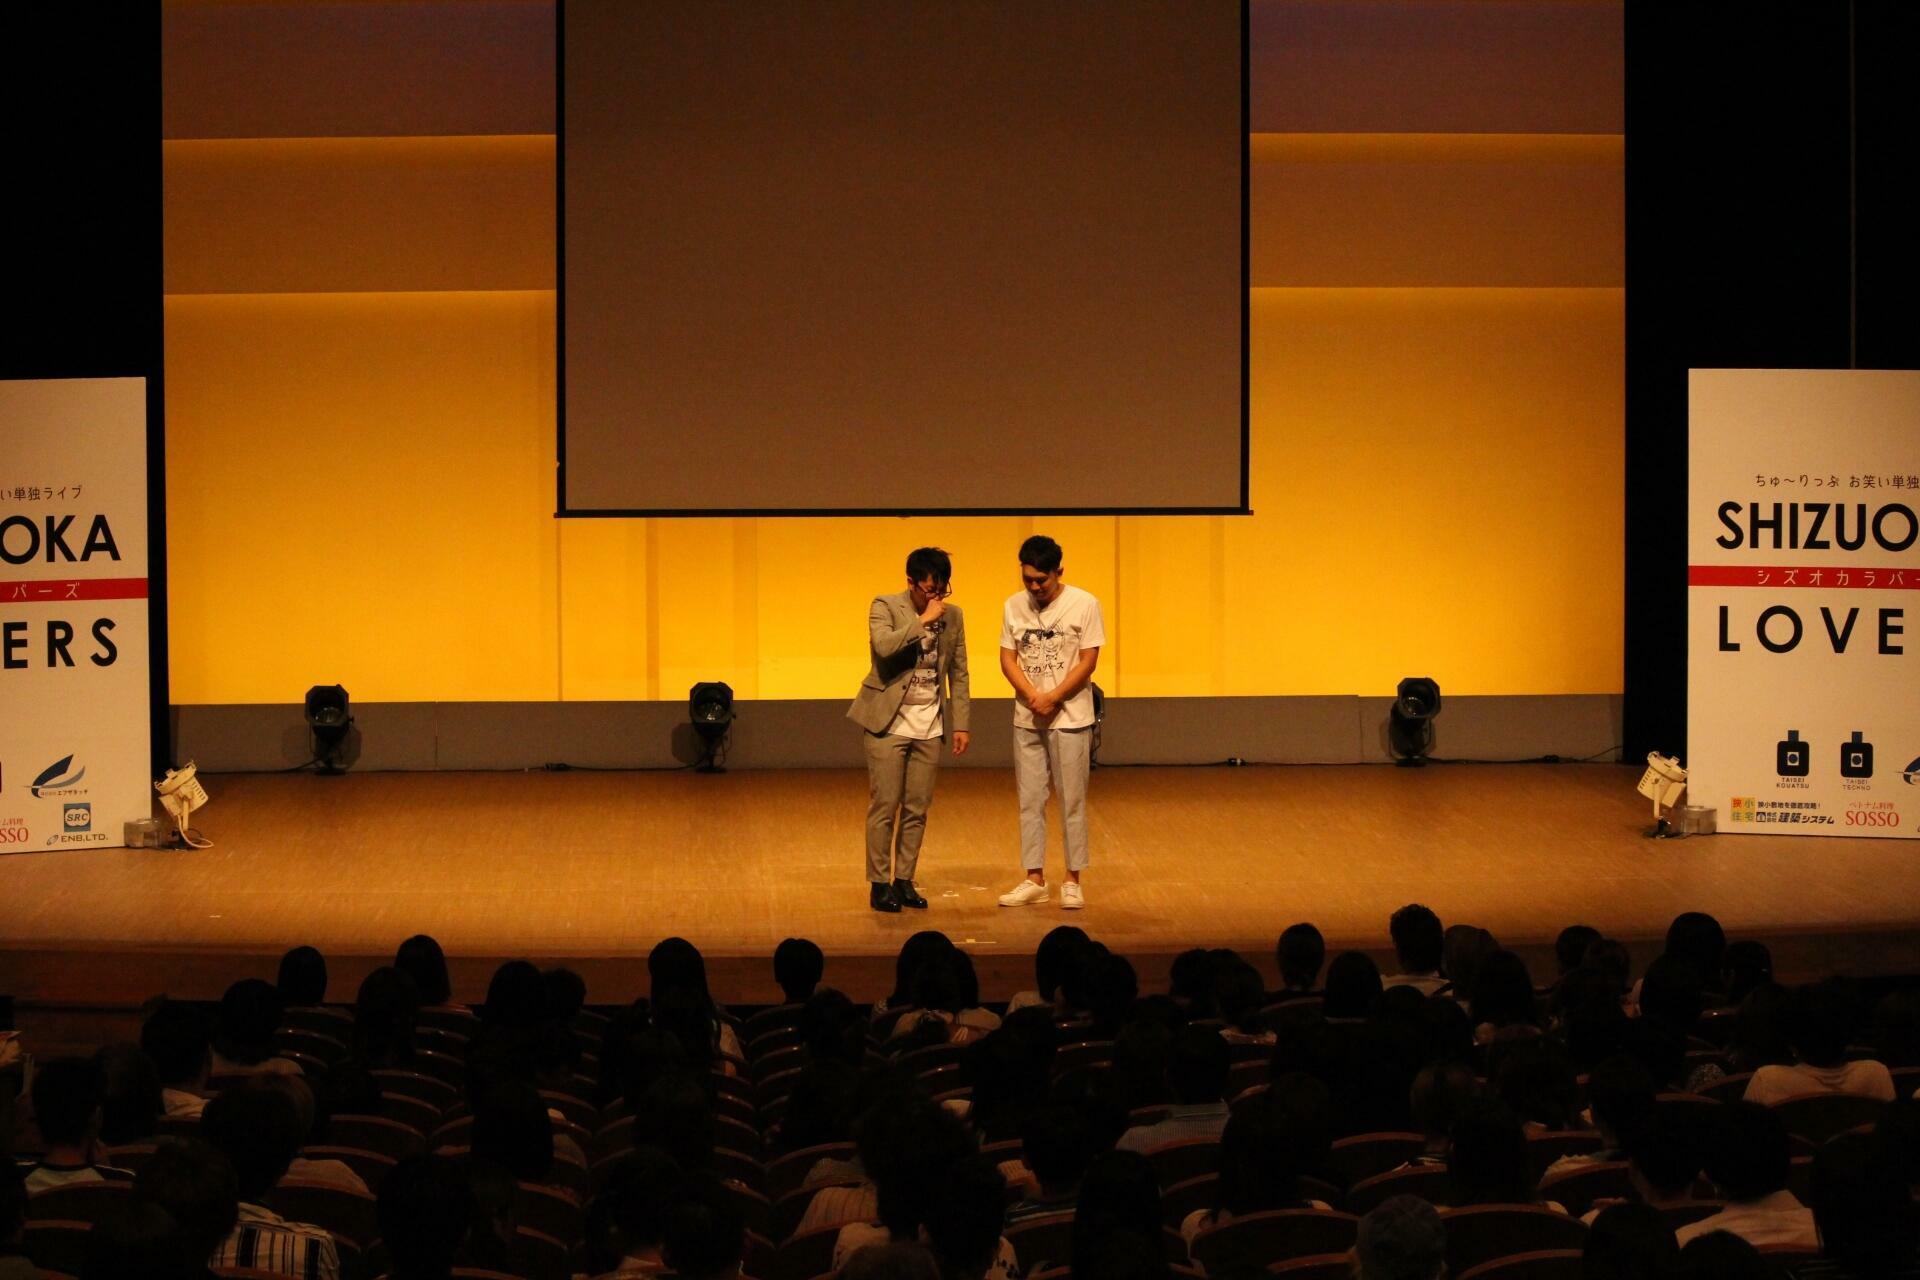 http://47web.jp/shizuoka/uploads/20190812_190813_0018.jpg